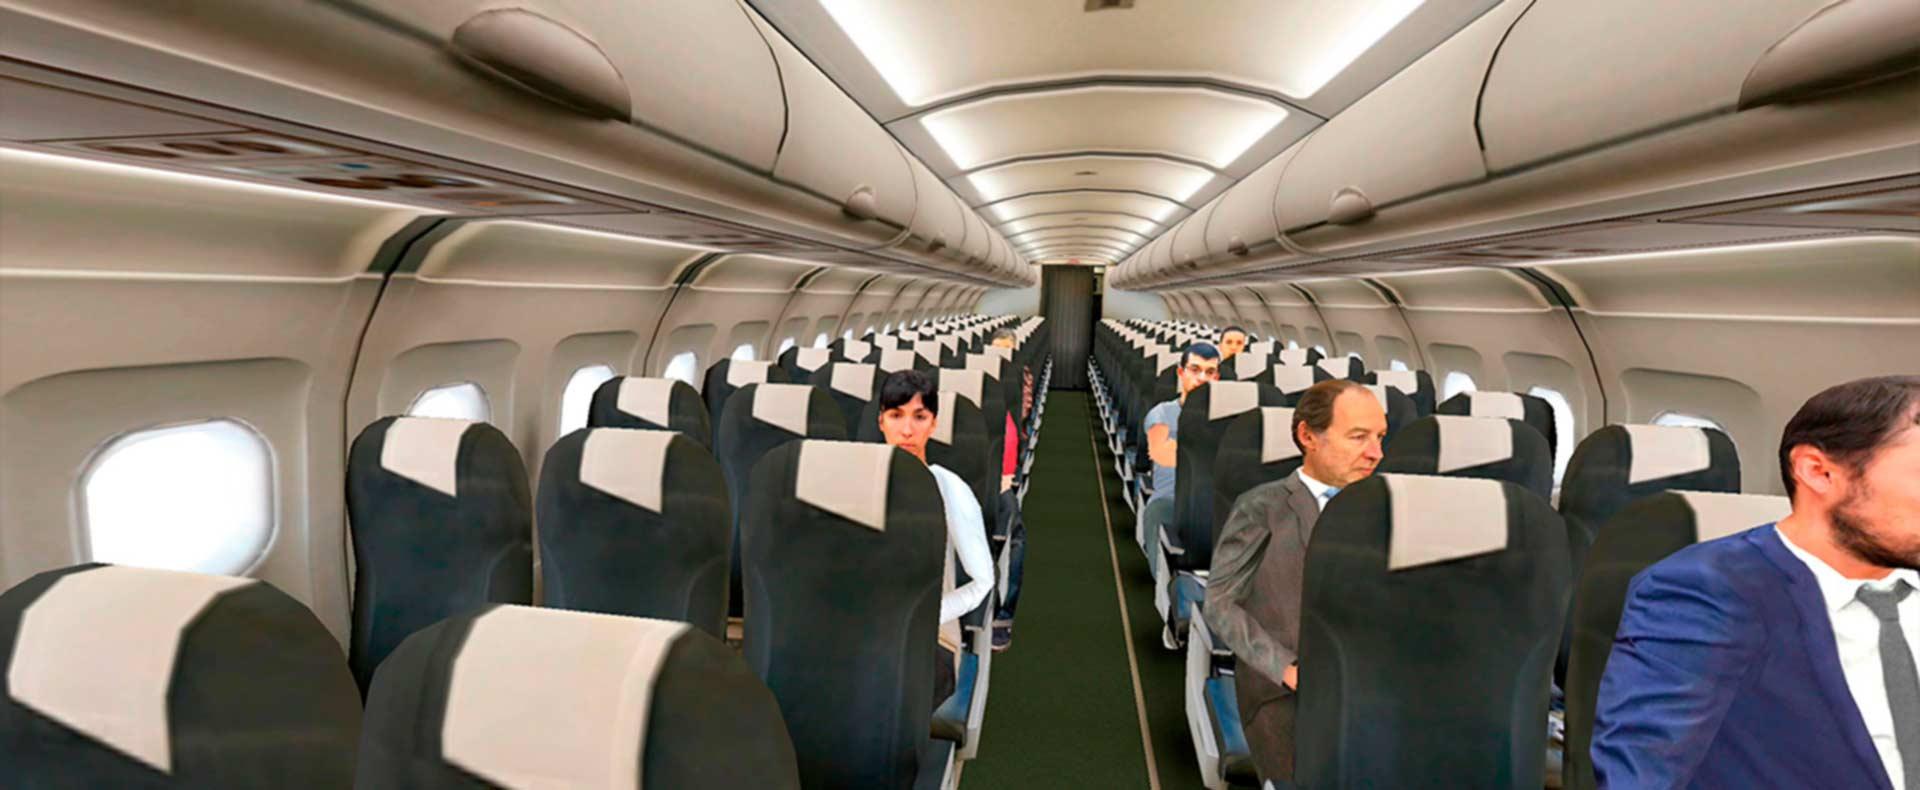 Club Salud 24h: Miedo A Volar Terapia Virtual BNR